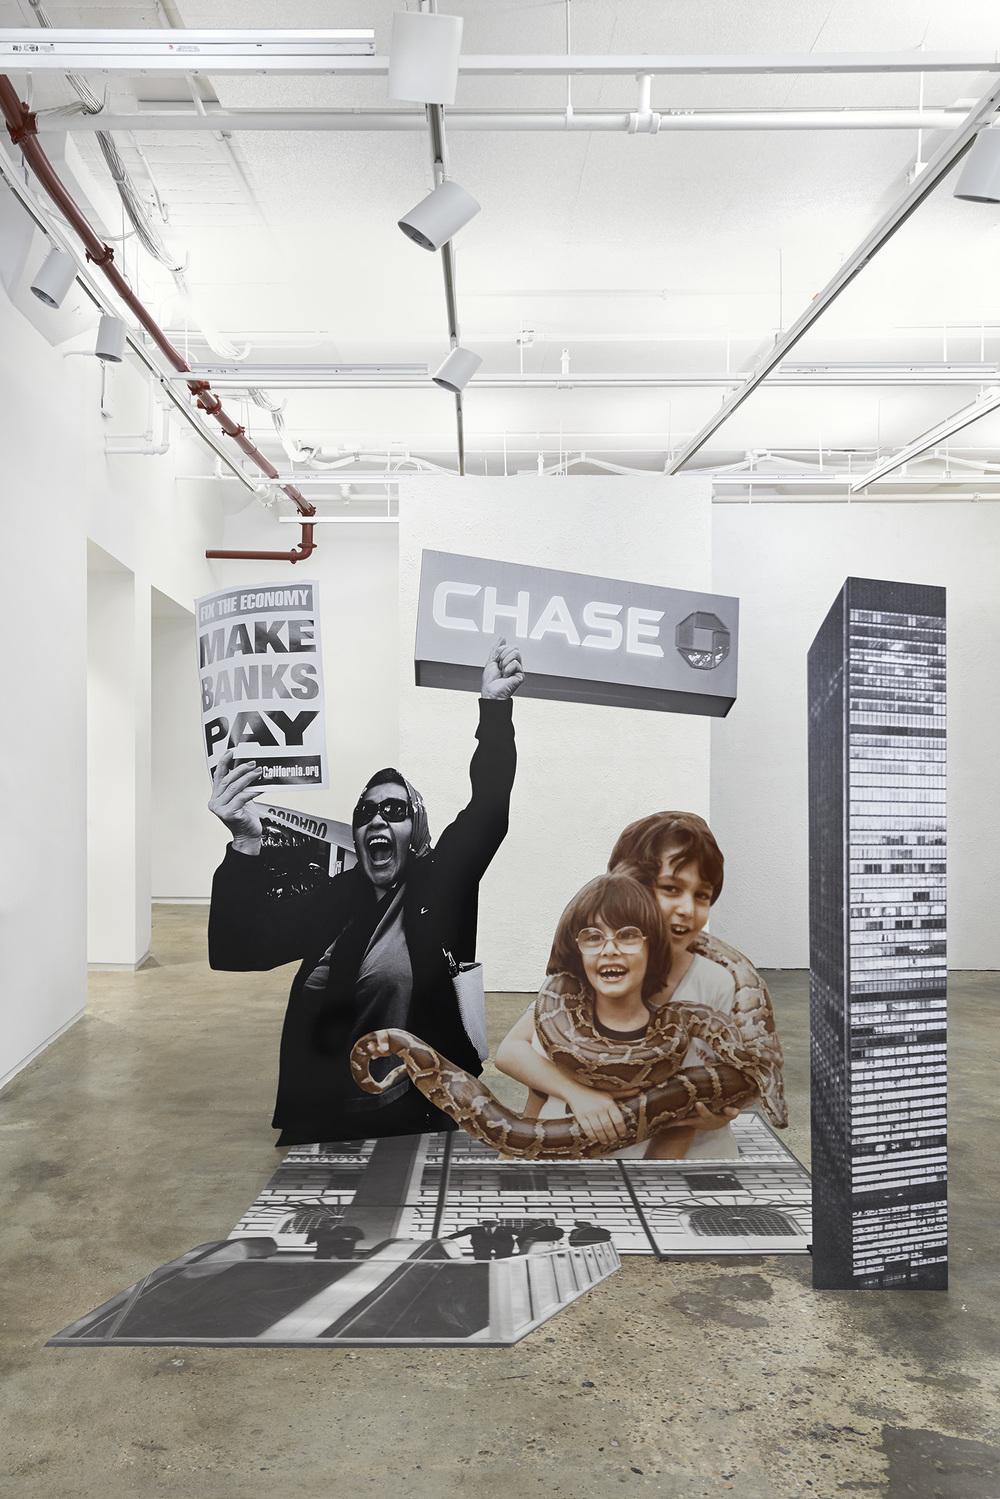 Chase Manhattan Plaza, Protester, Sara, Cyrus and Python,